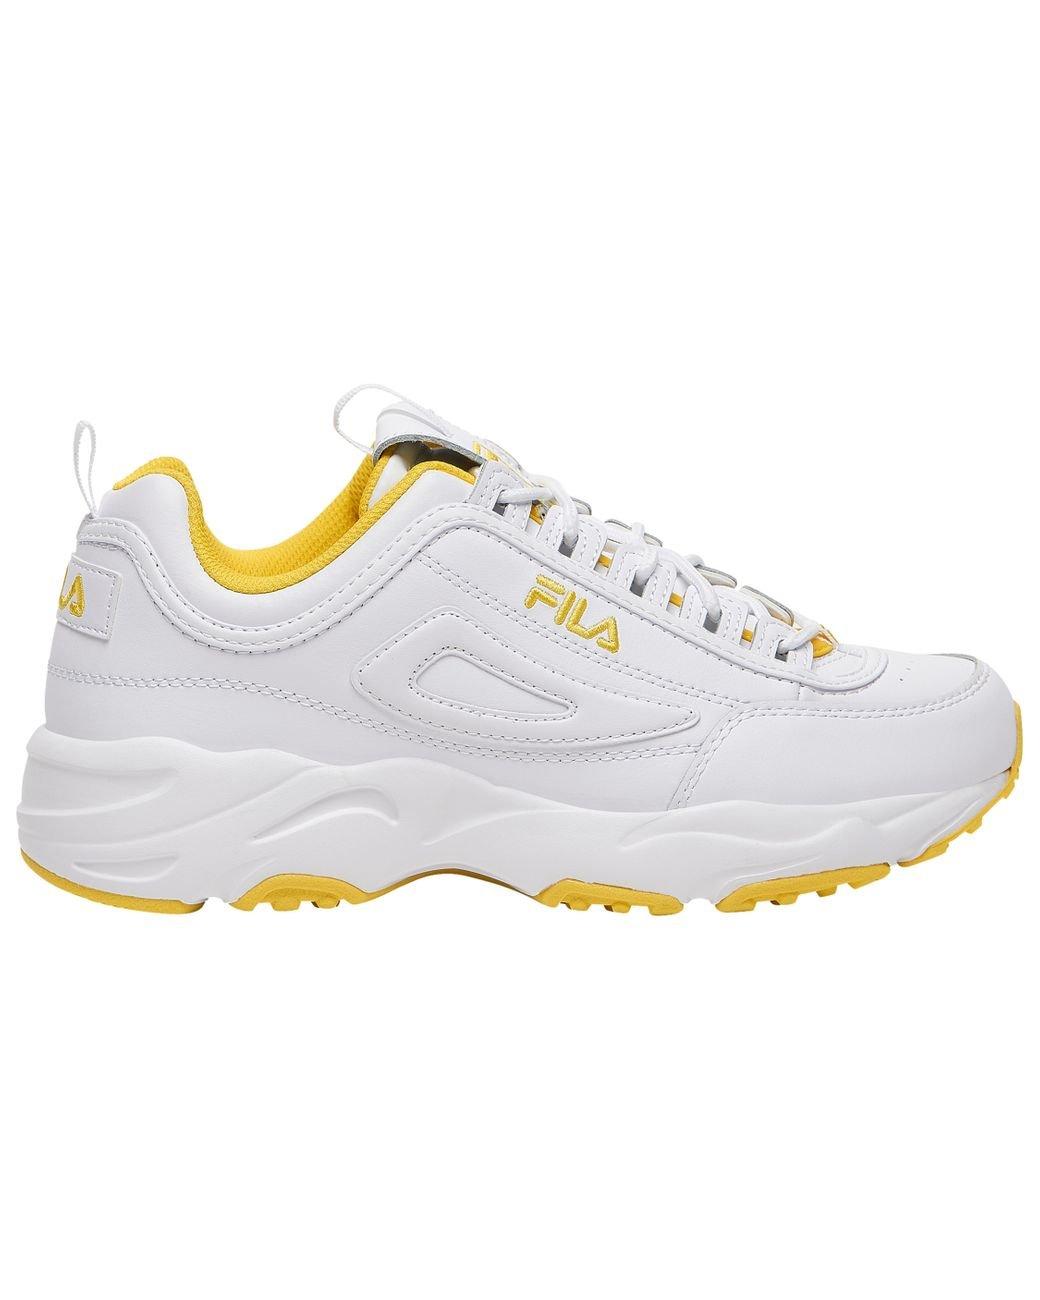 eastbay fila shoes